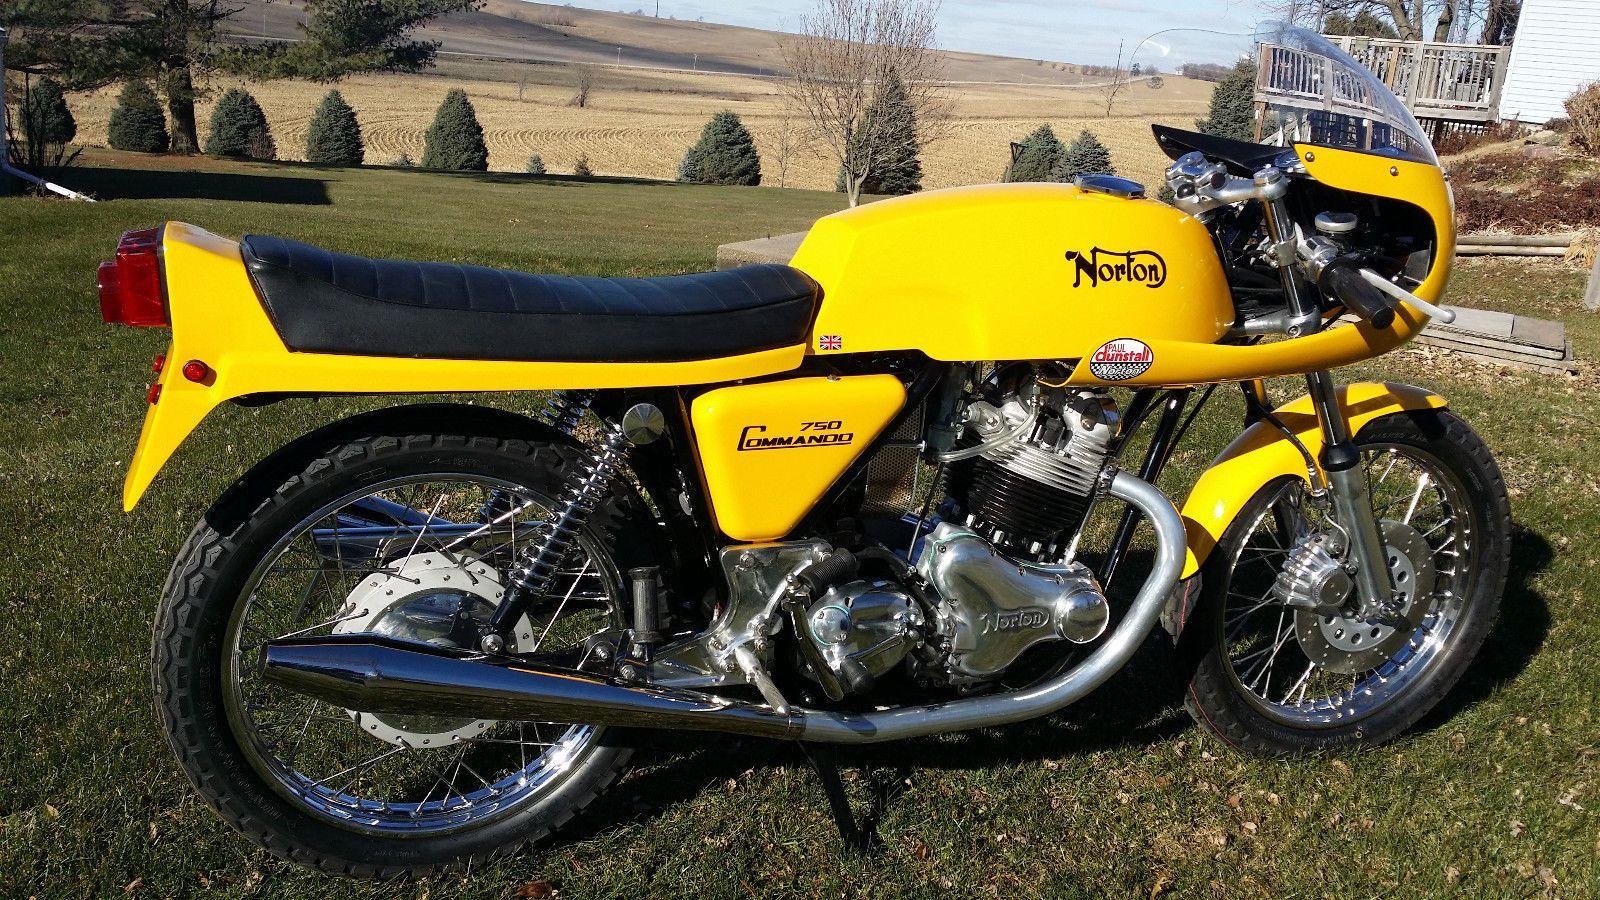 For Sale 1972 Norton Commando 750 Cafe Racer